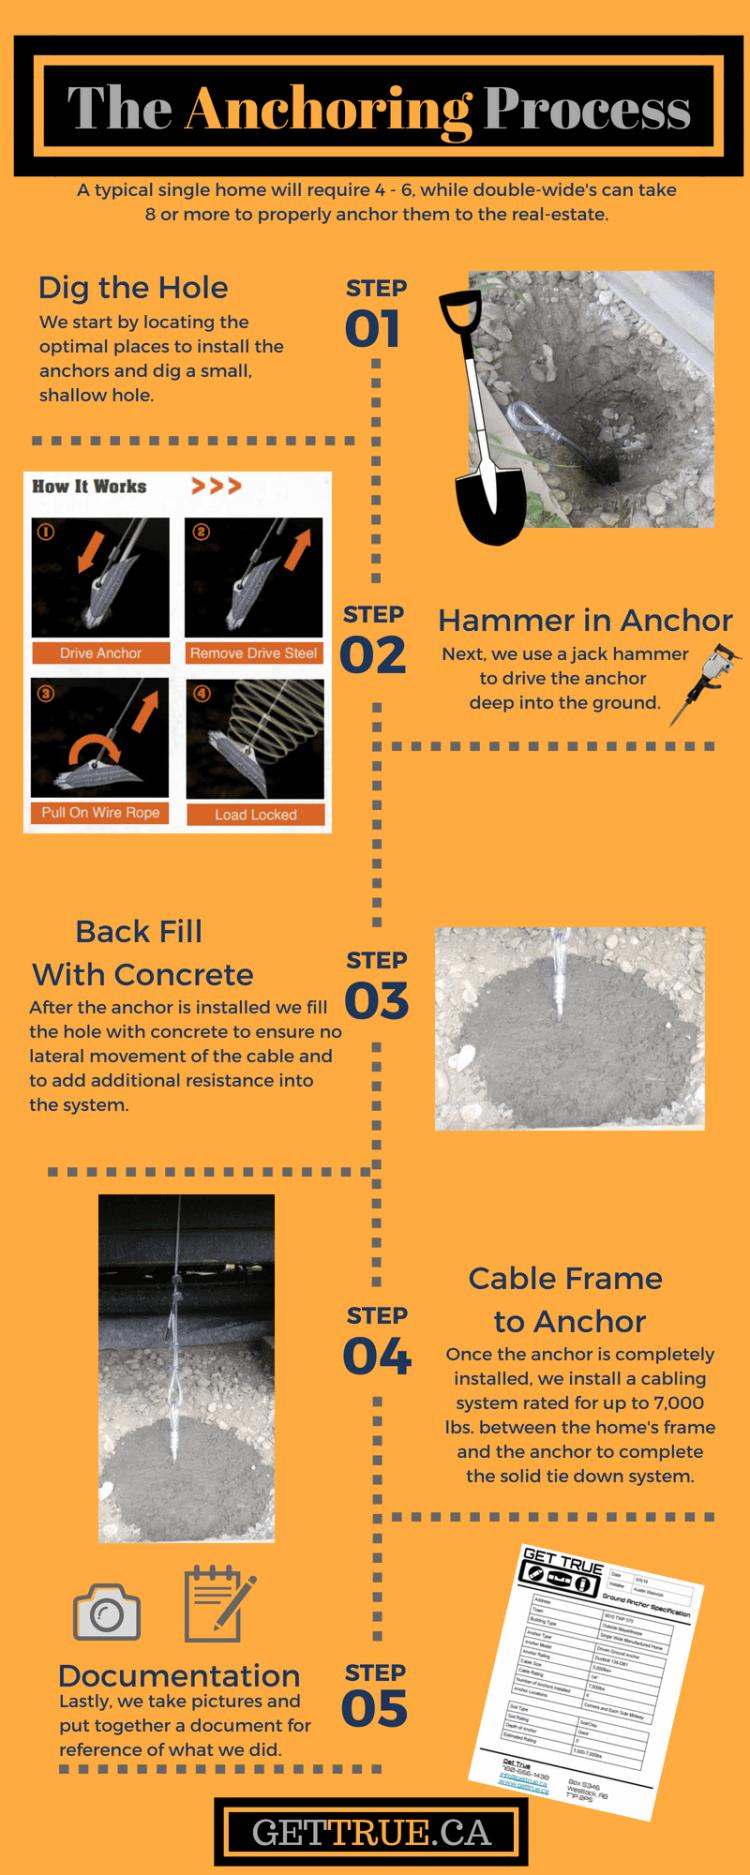 Mobile Home Anchor Process